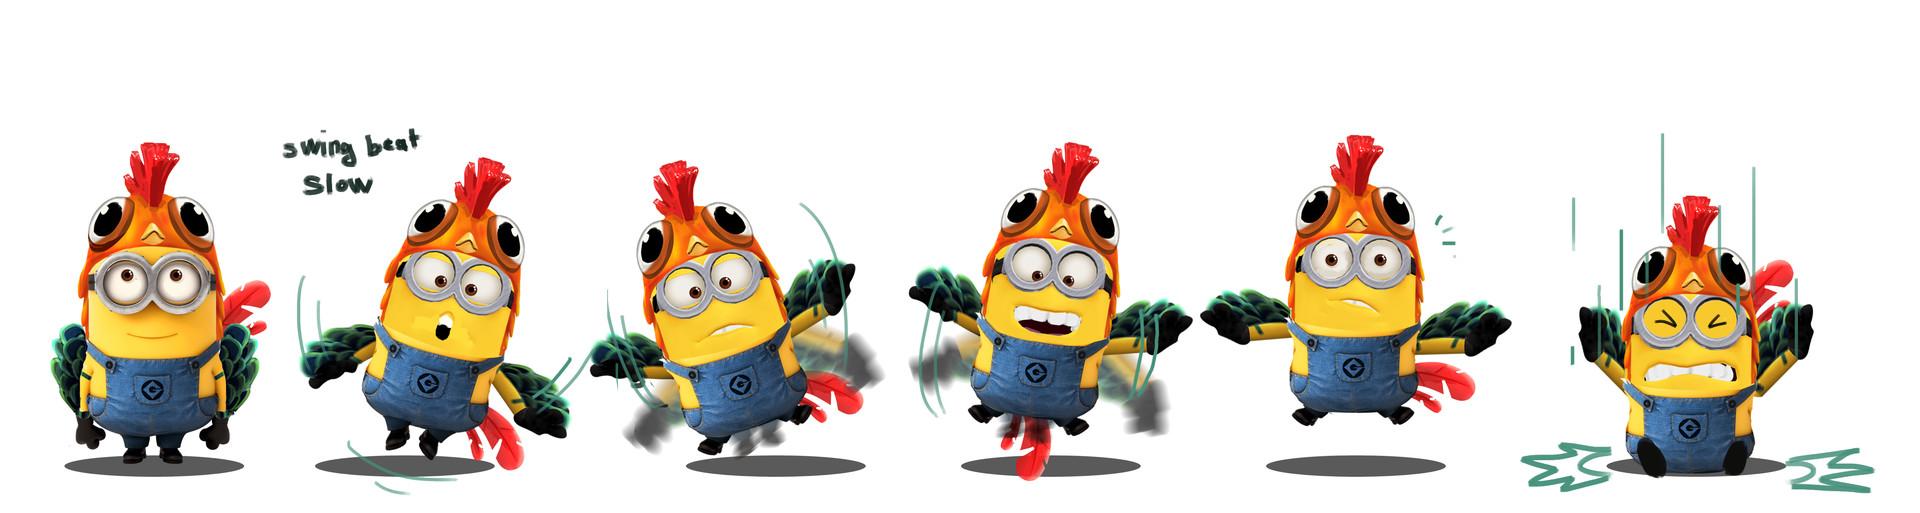 67b90618b8 Thanh le van animation flys a